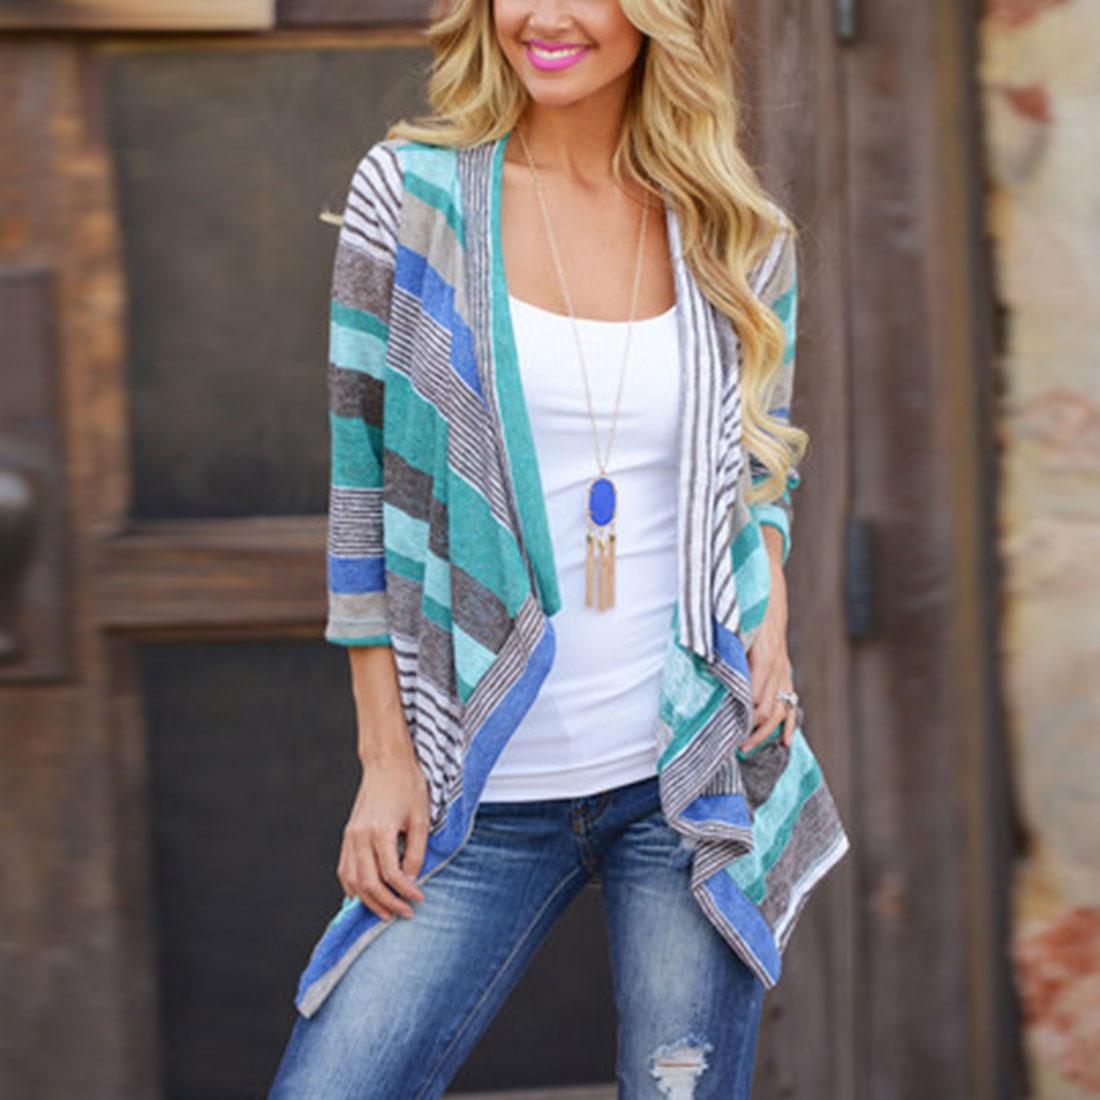 JIMMYHANK Women Fashion Boho Autumn Geometric Printed Irregular Long Sleeve Loose Knit Cardigans Coat